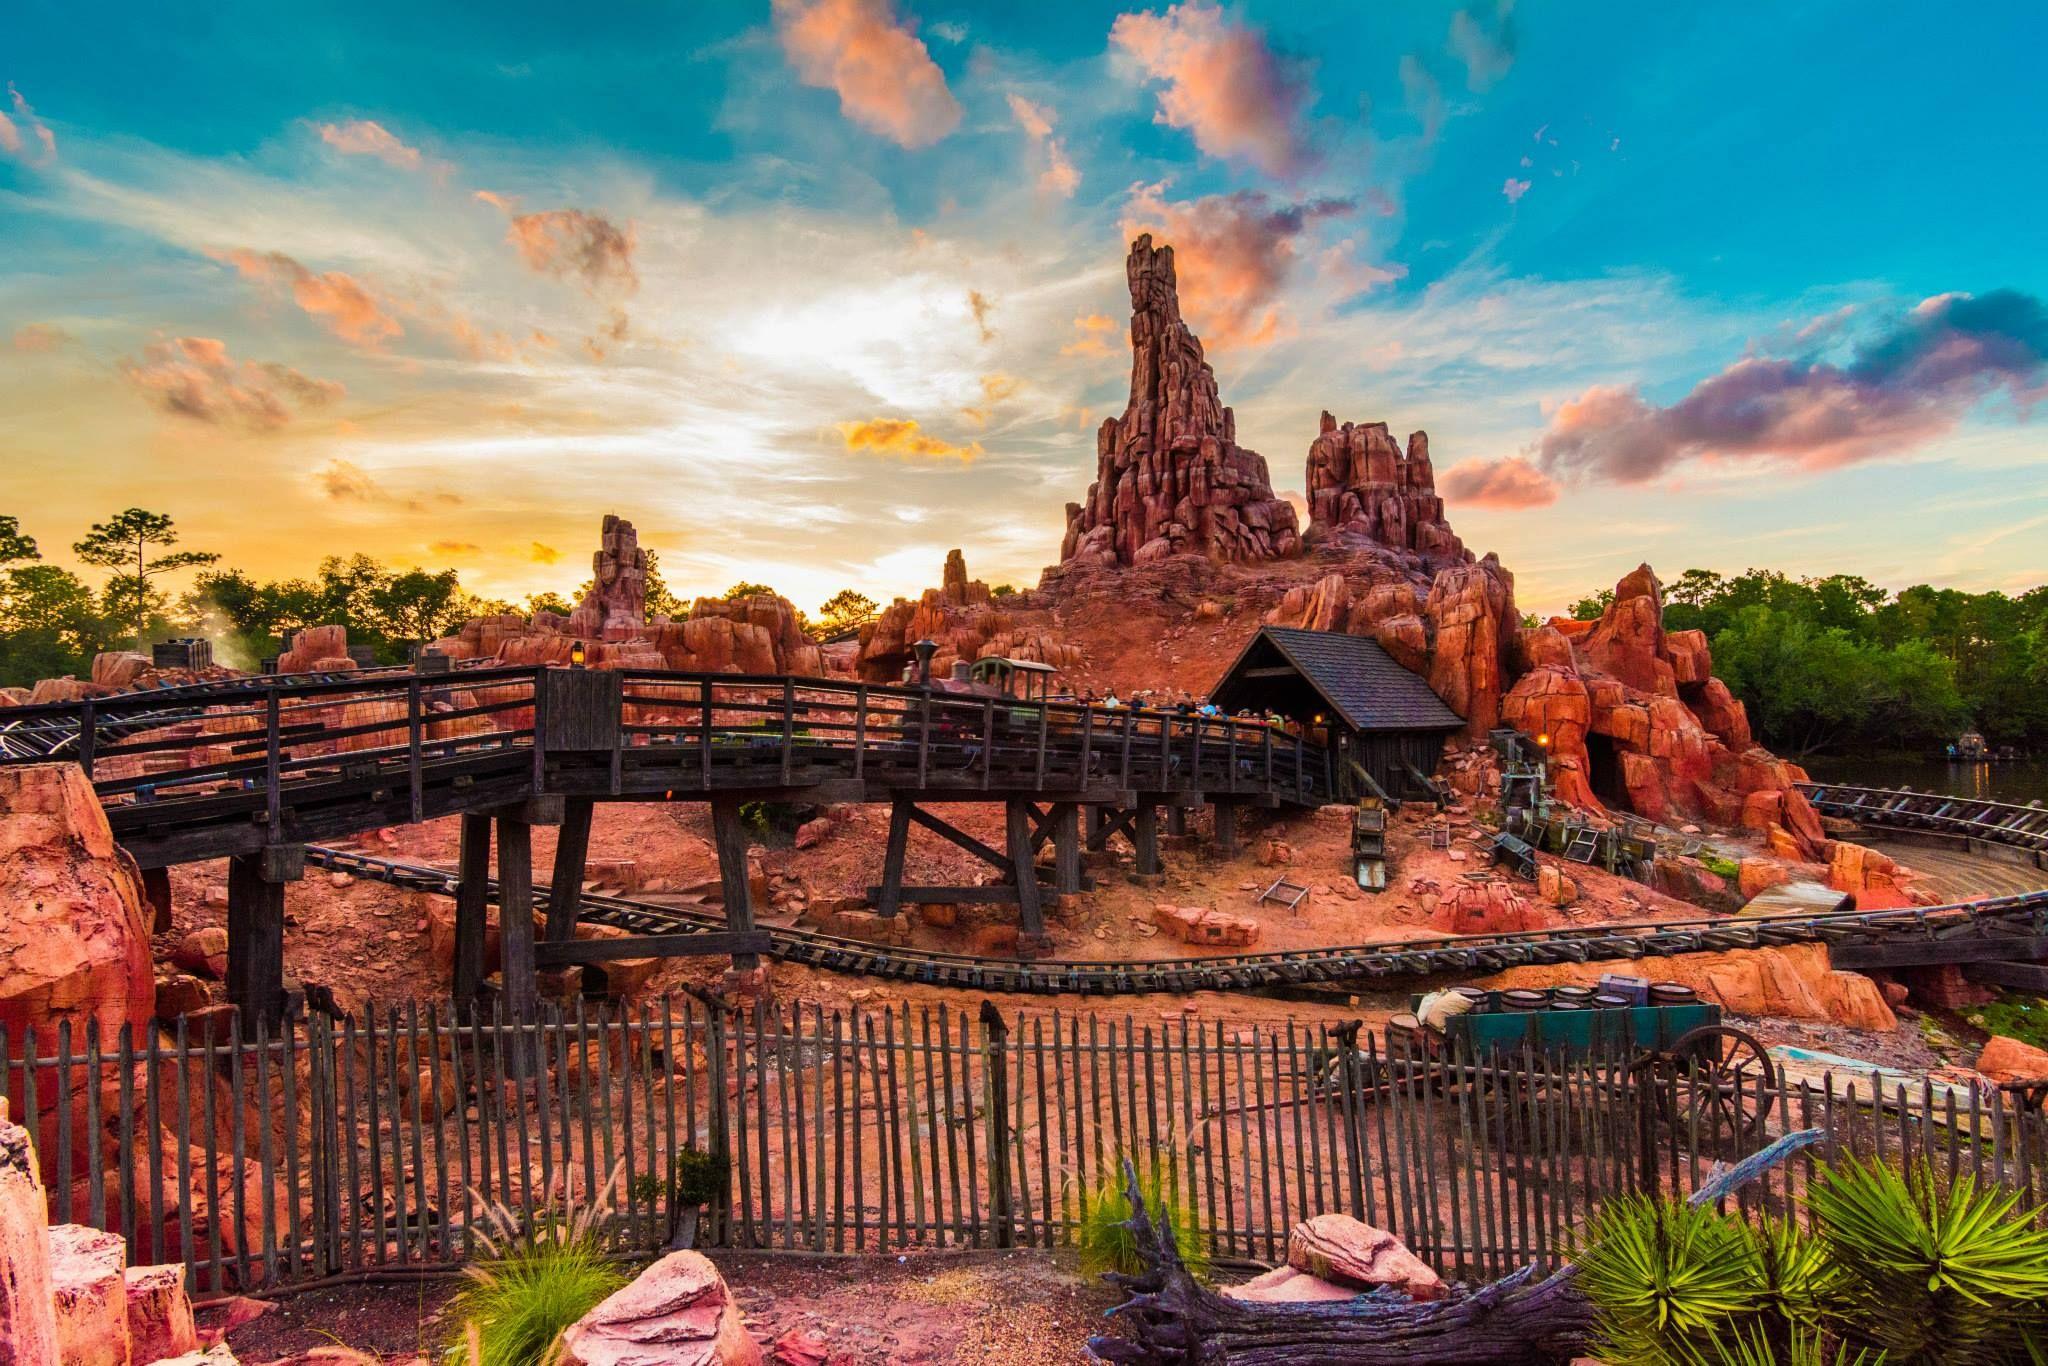 walt disney world rides - Google Search | Disney